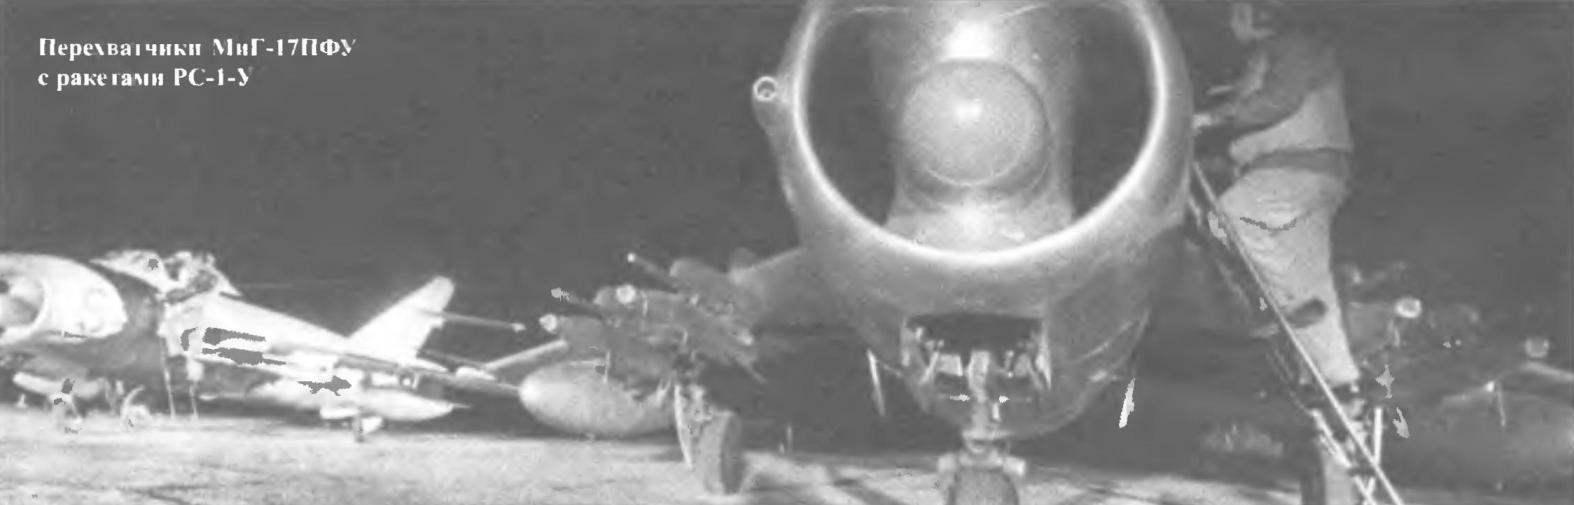 Перехватчики МиГ-17ПФУ с ракетами РС-1-У